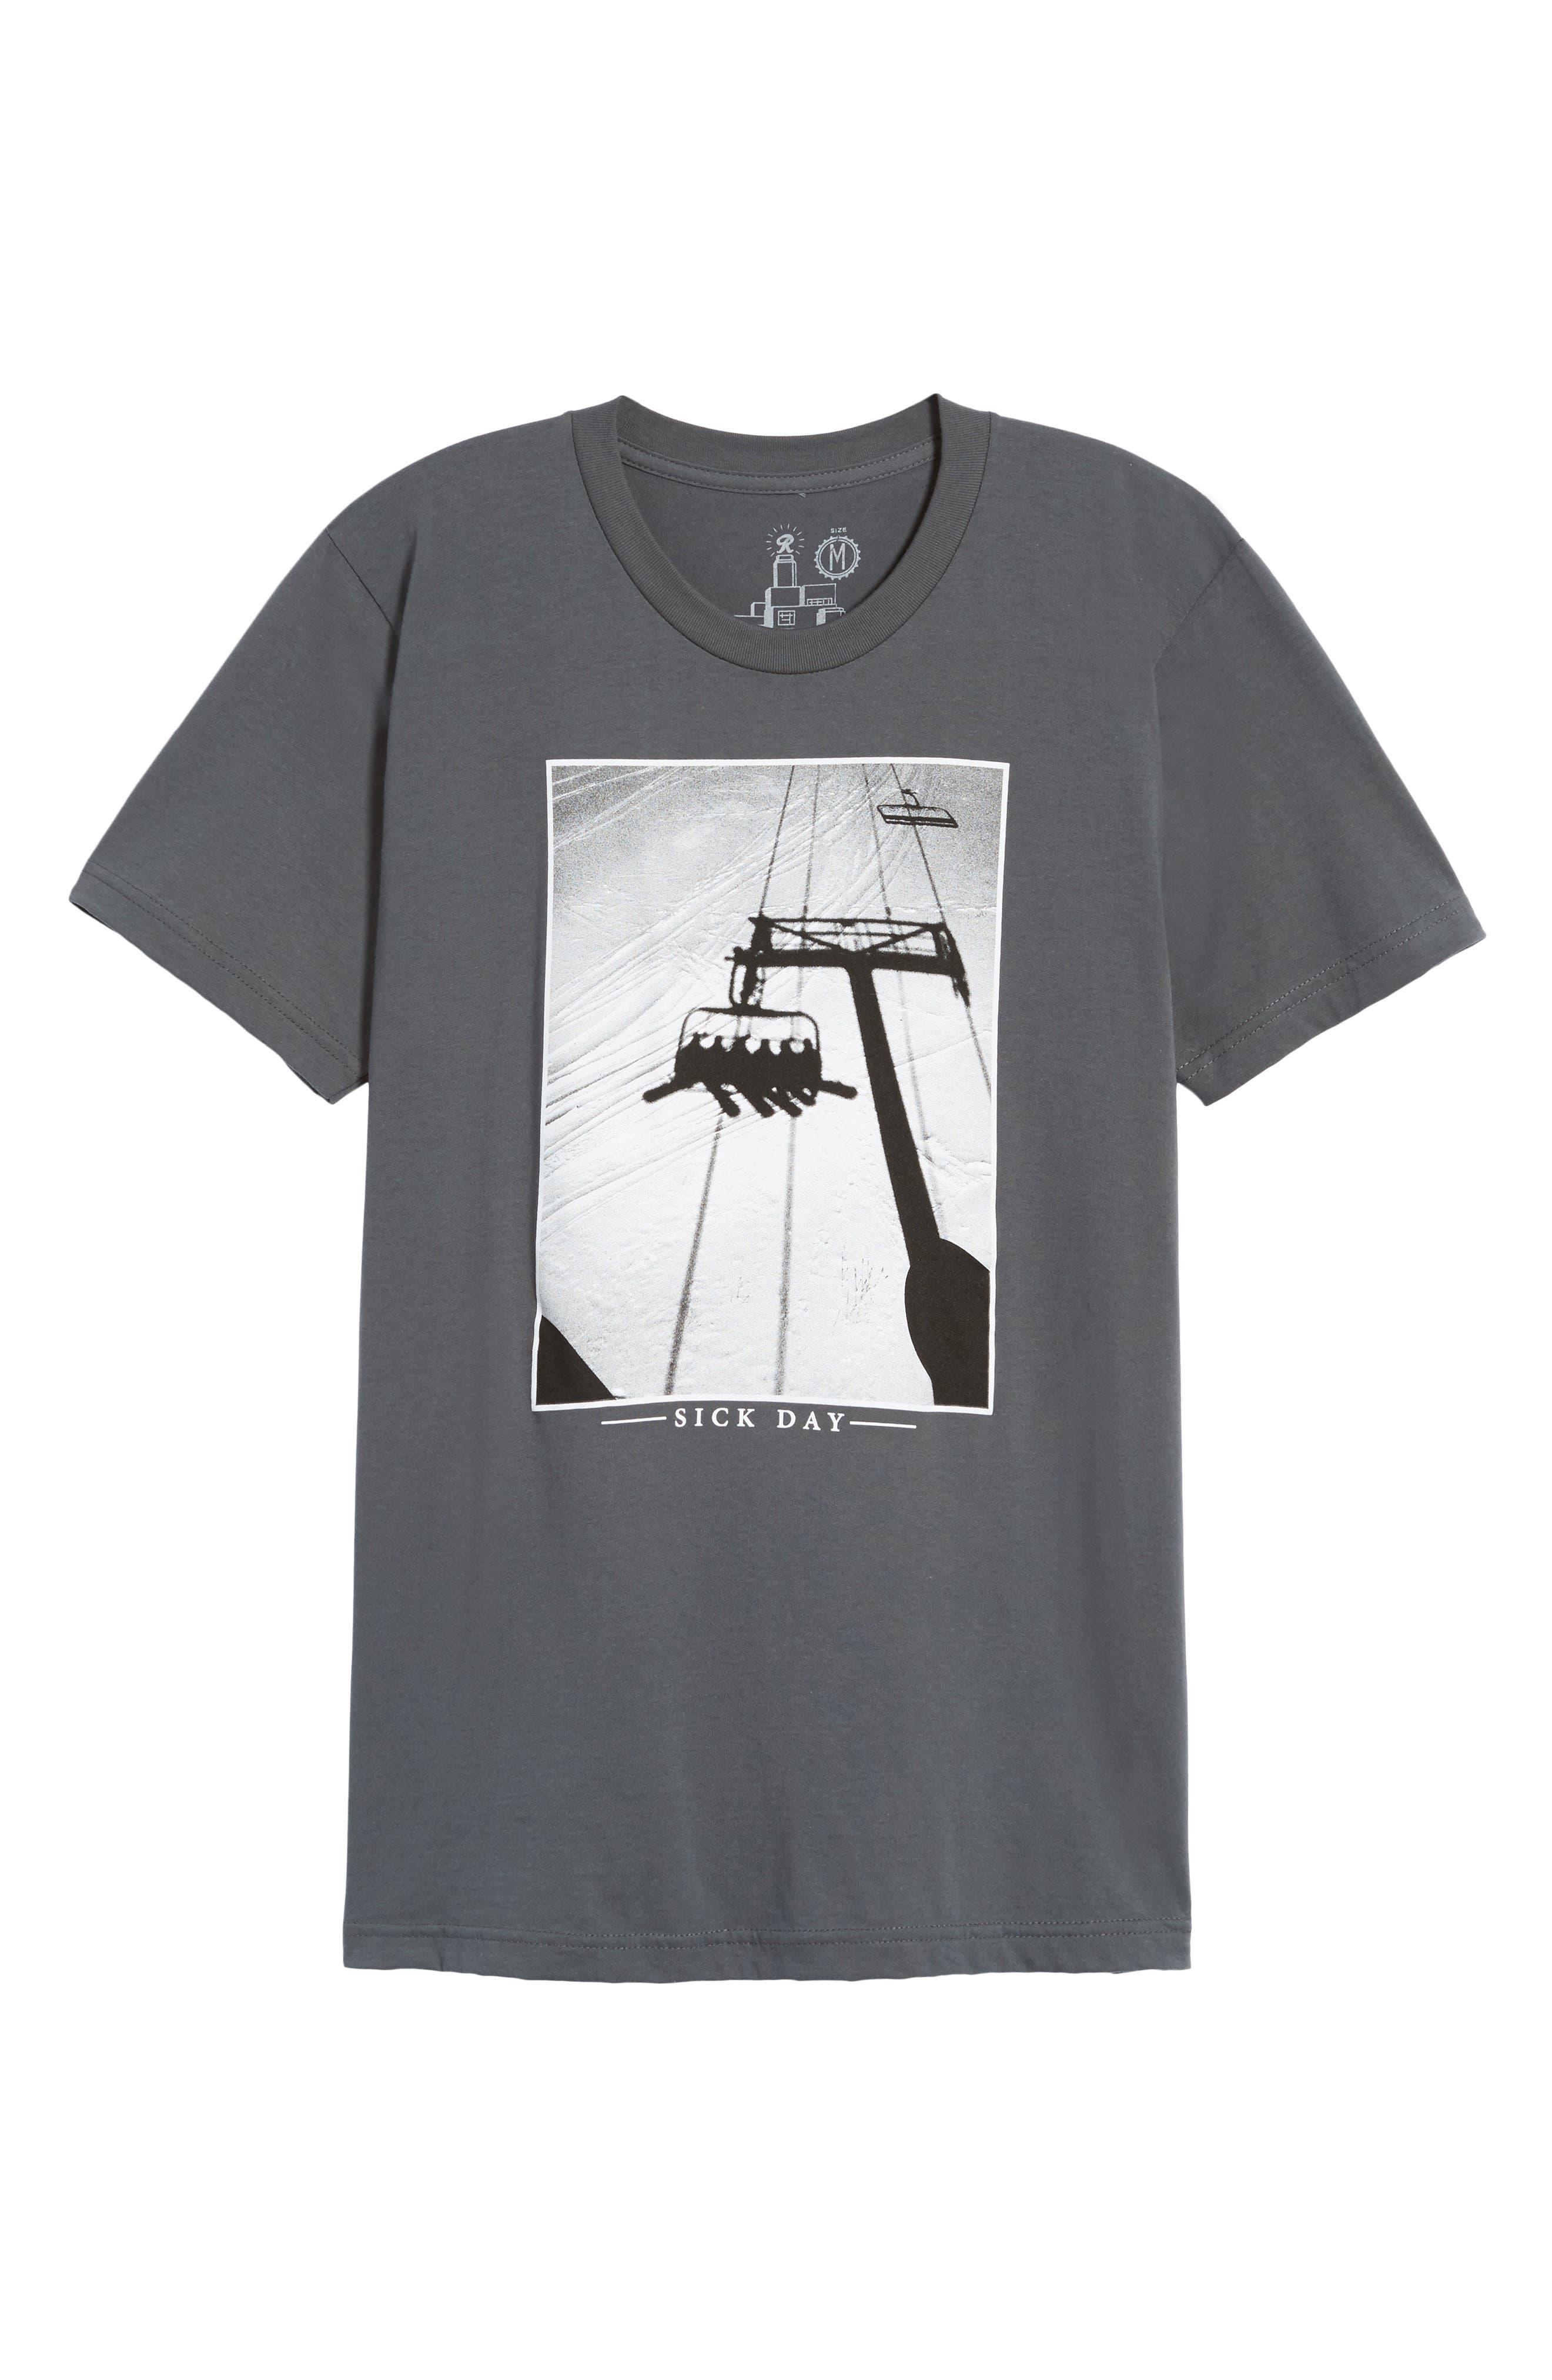 Sick Day T-Shirt,                             Alternate thumbnail 6, color,                             Asphalt